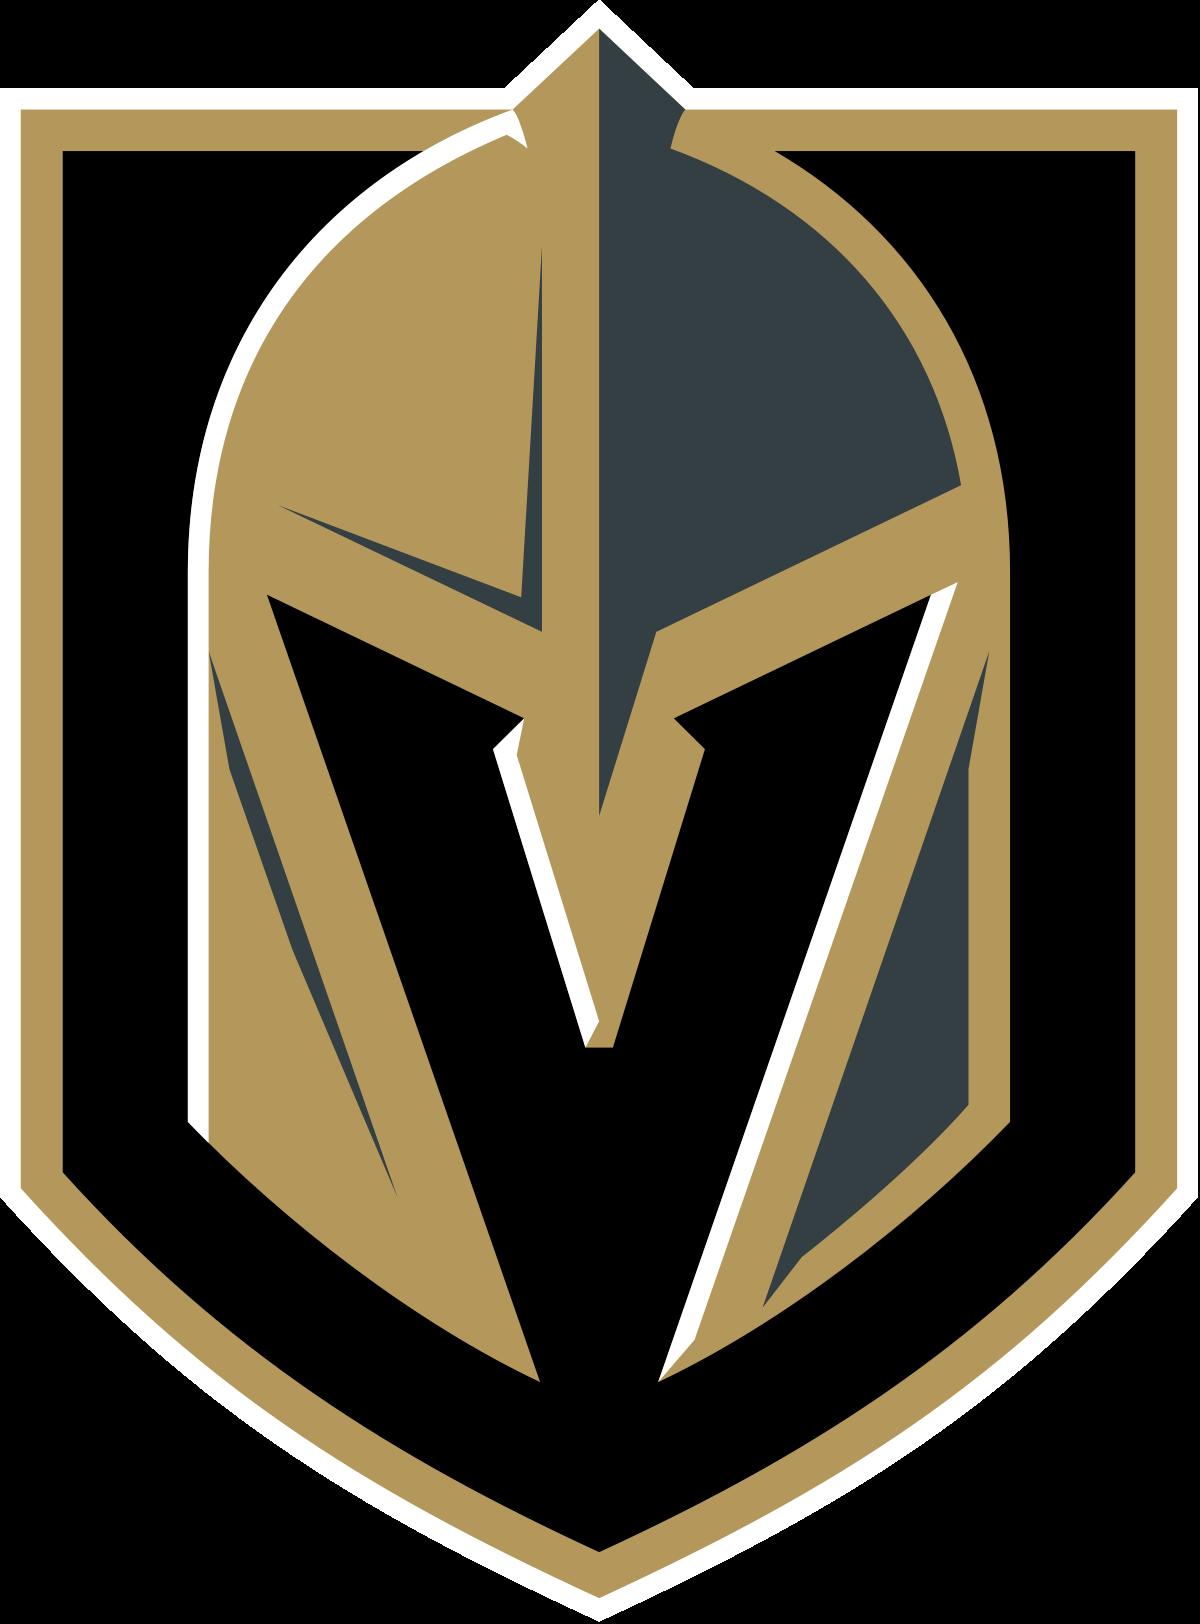 Las Vegas Golden Knights keps logo nhl